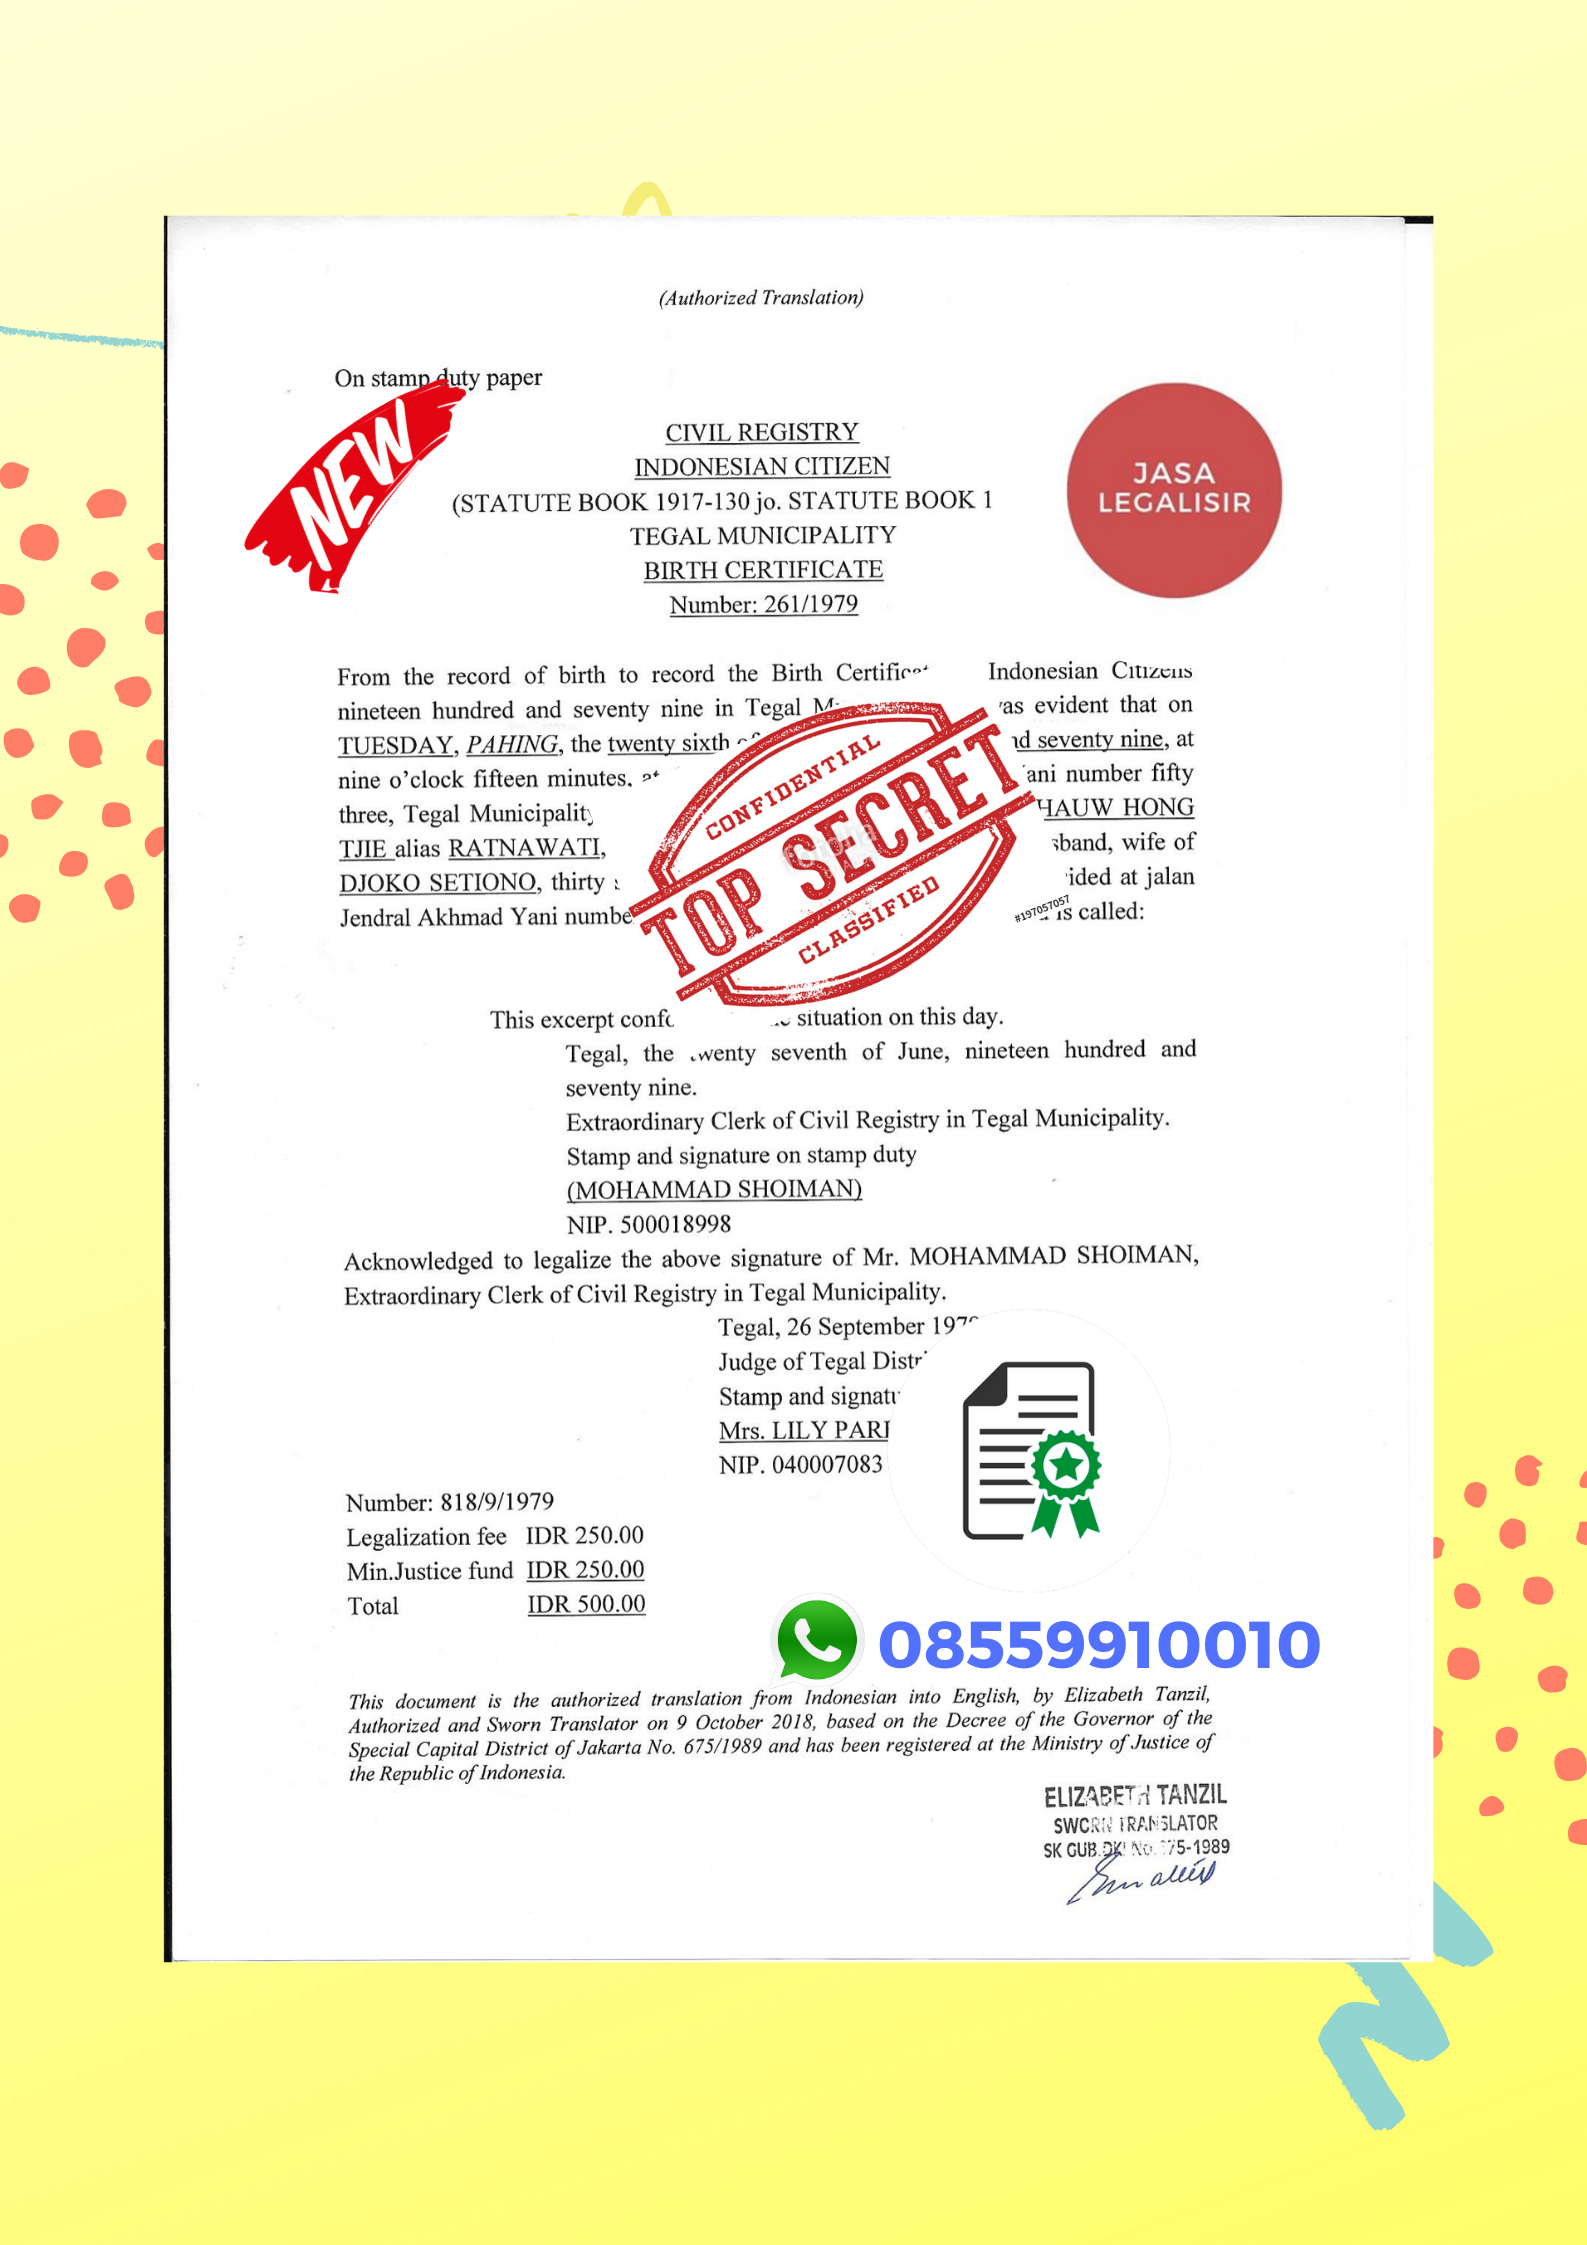 Jasa Legalisir Turki || 08559910010